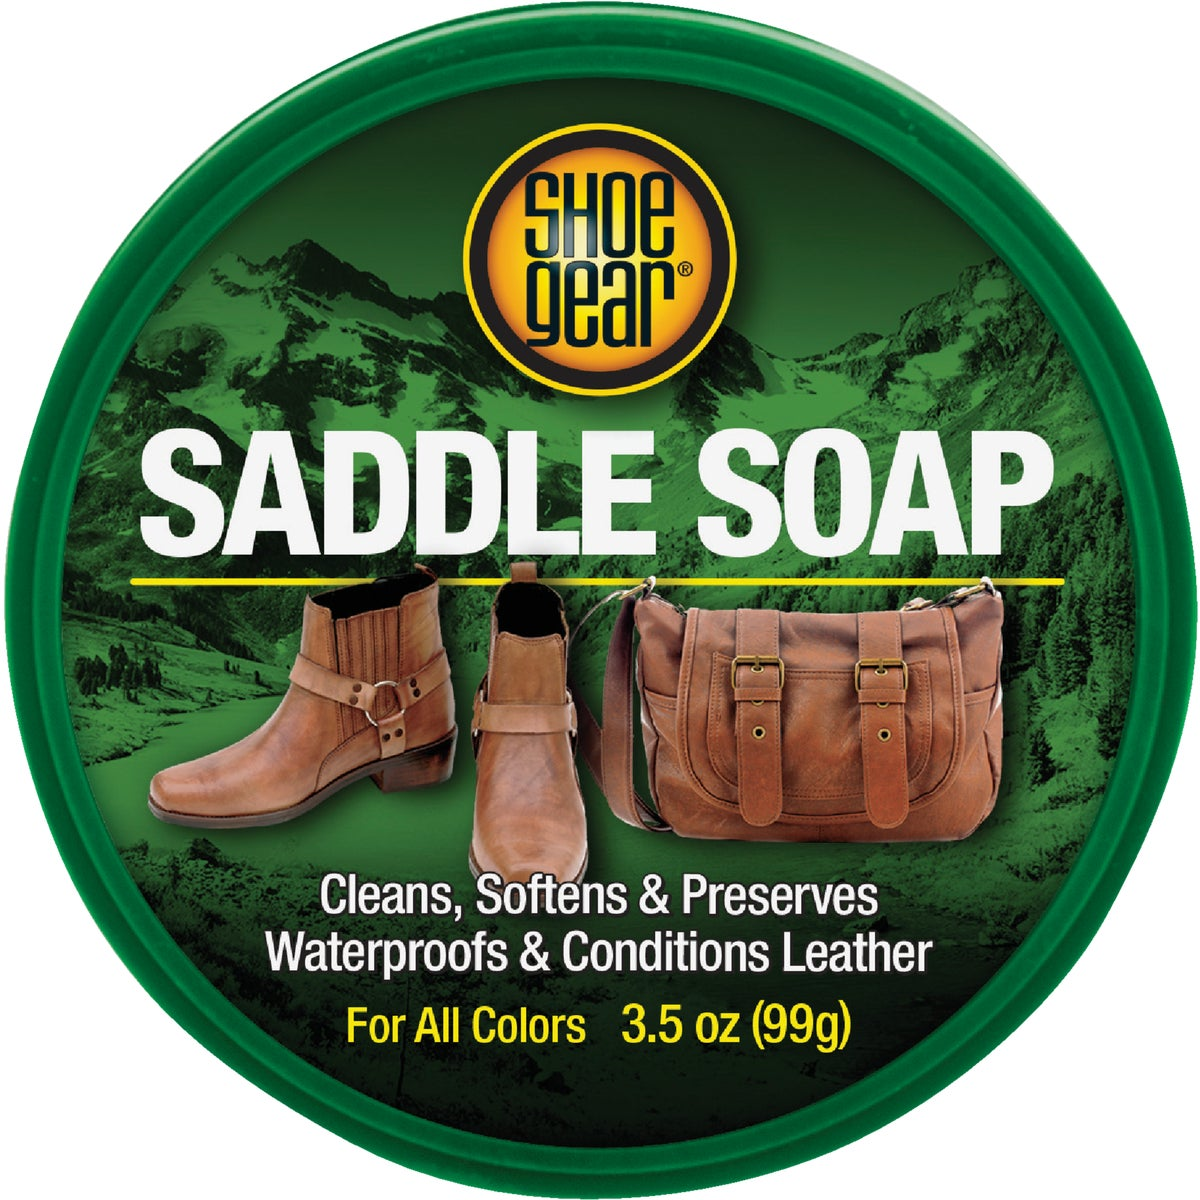 SADDLE SOAP PASTE